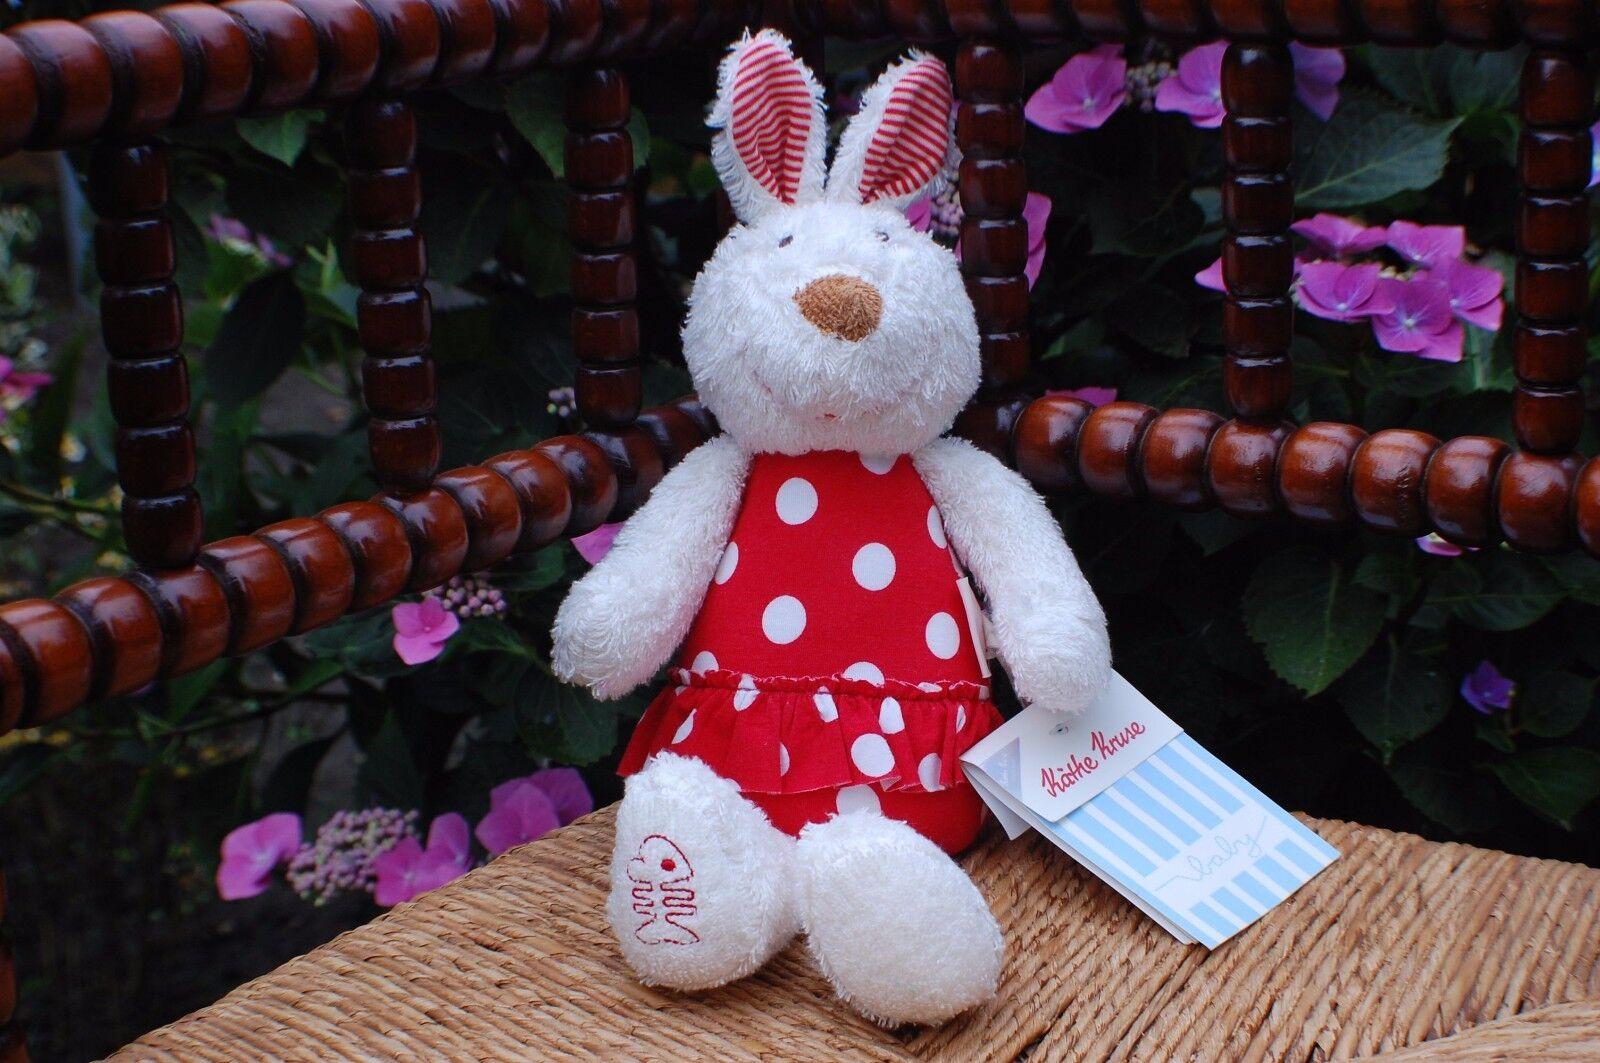 Kathe Kruse Carla Mare Musical Lullaby Rabbit Baby Safe RETIrot 2012 MINT wTags